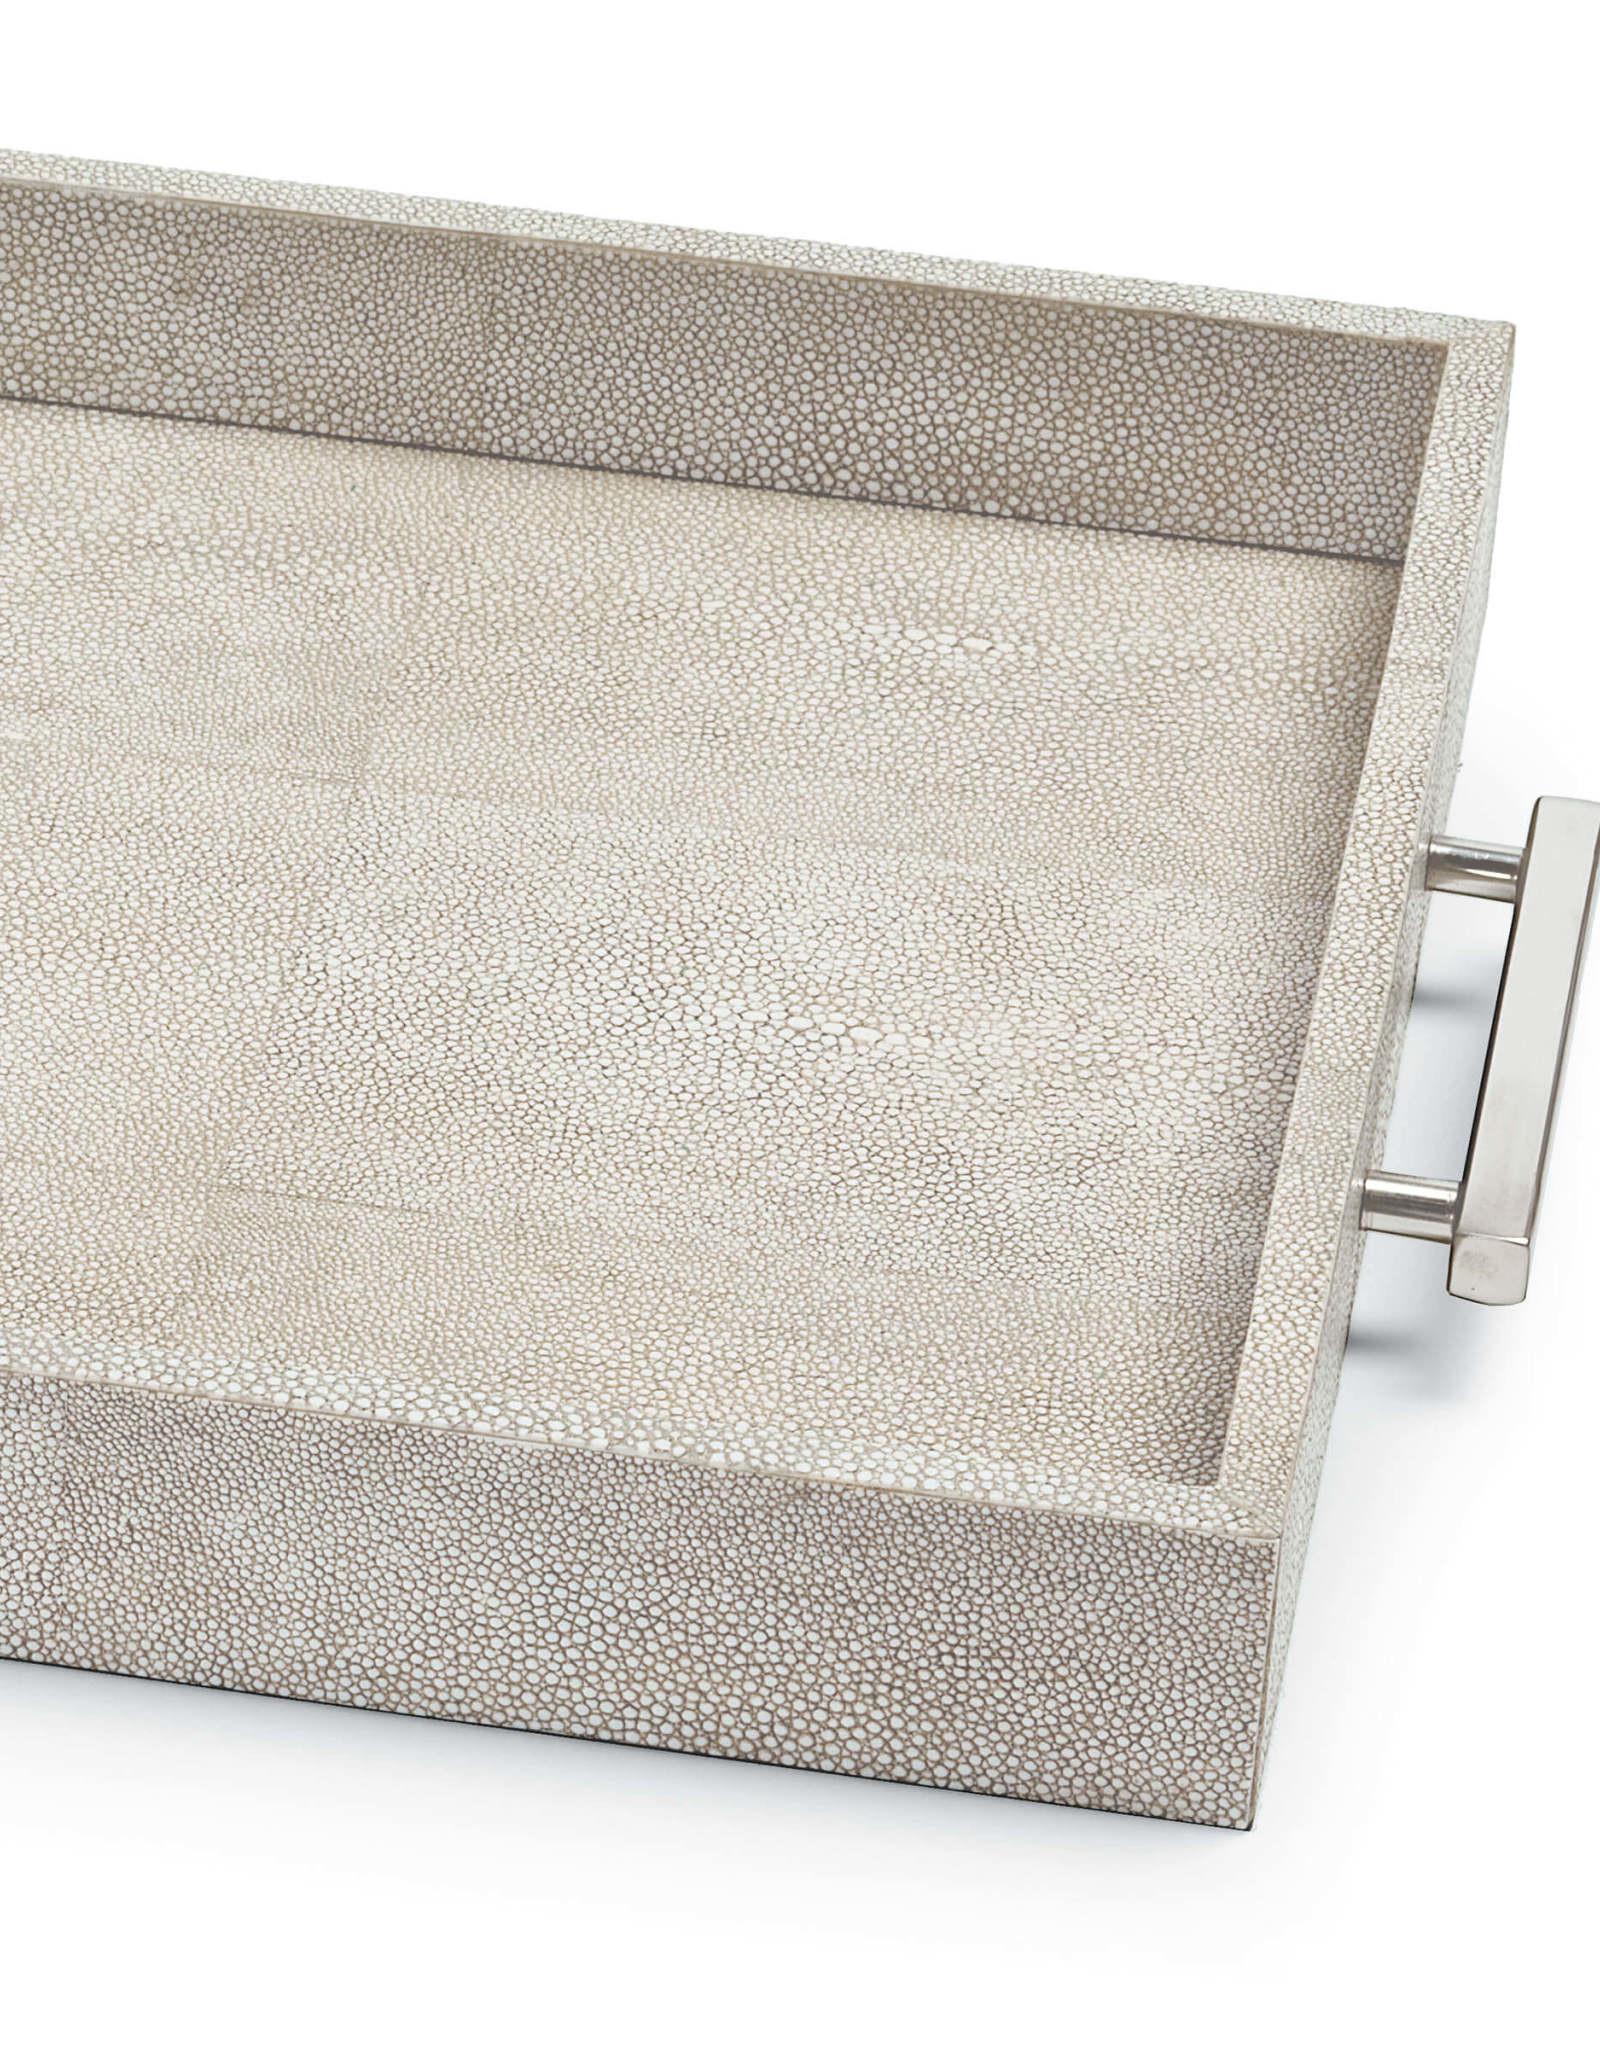 Regina Andrew Design Shagreen Rectangle Tray (Ivory Grey)